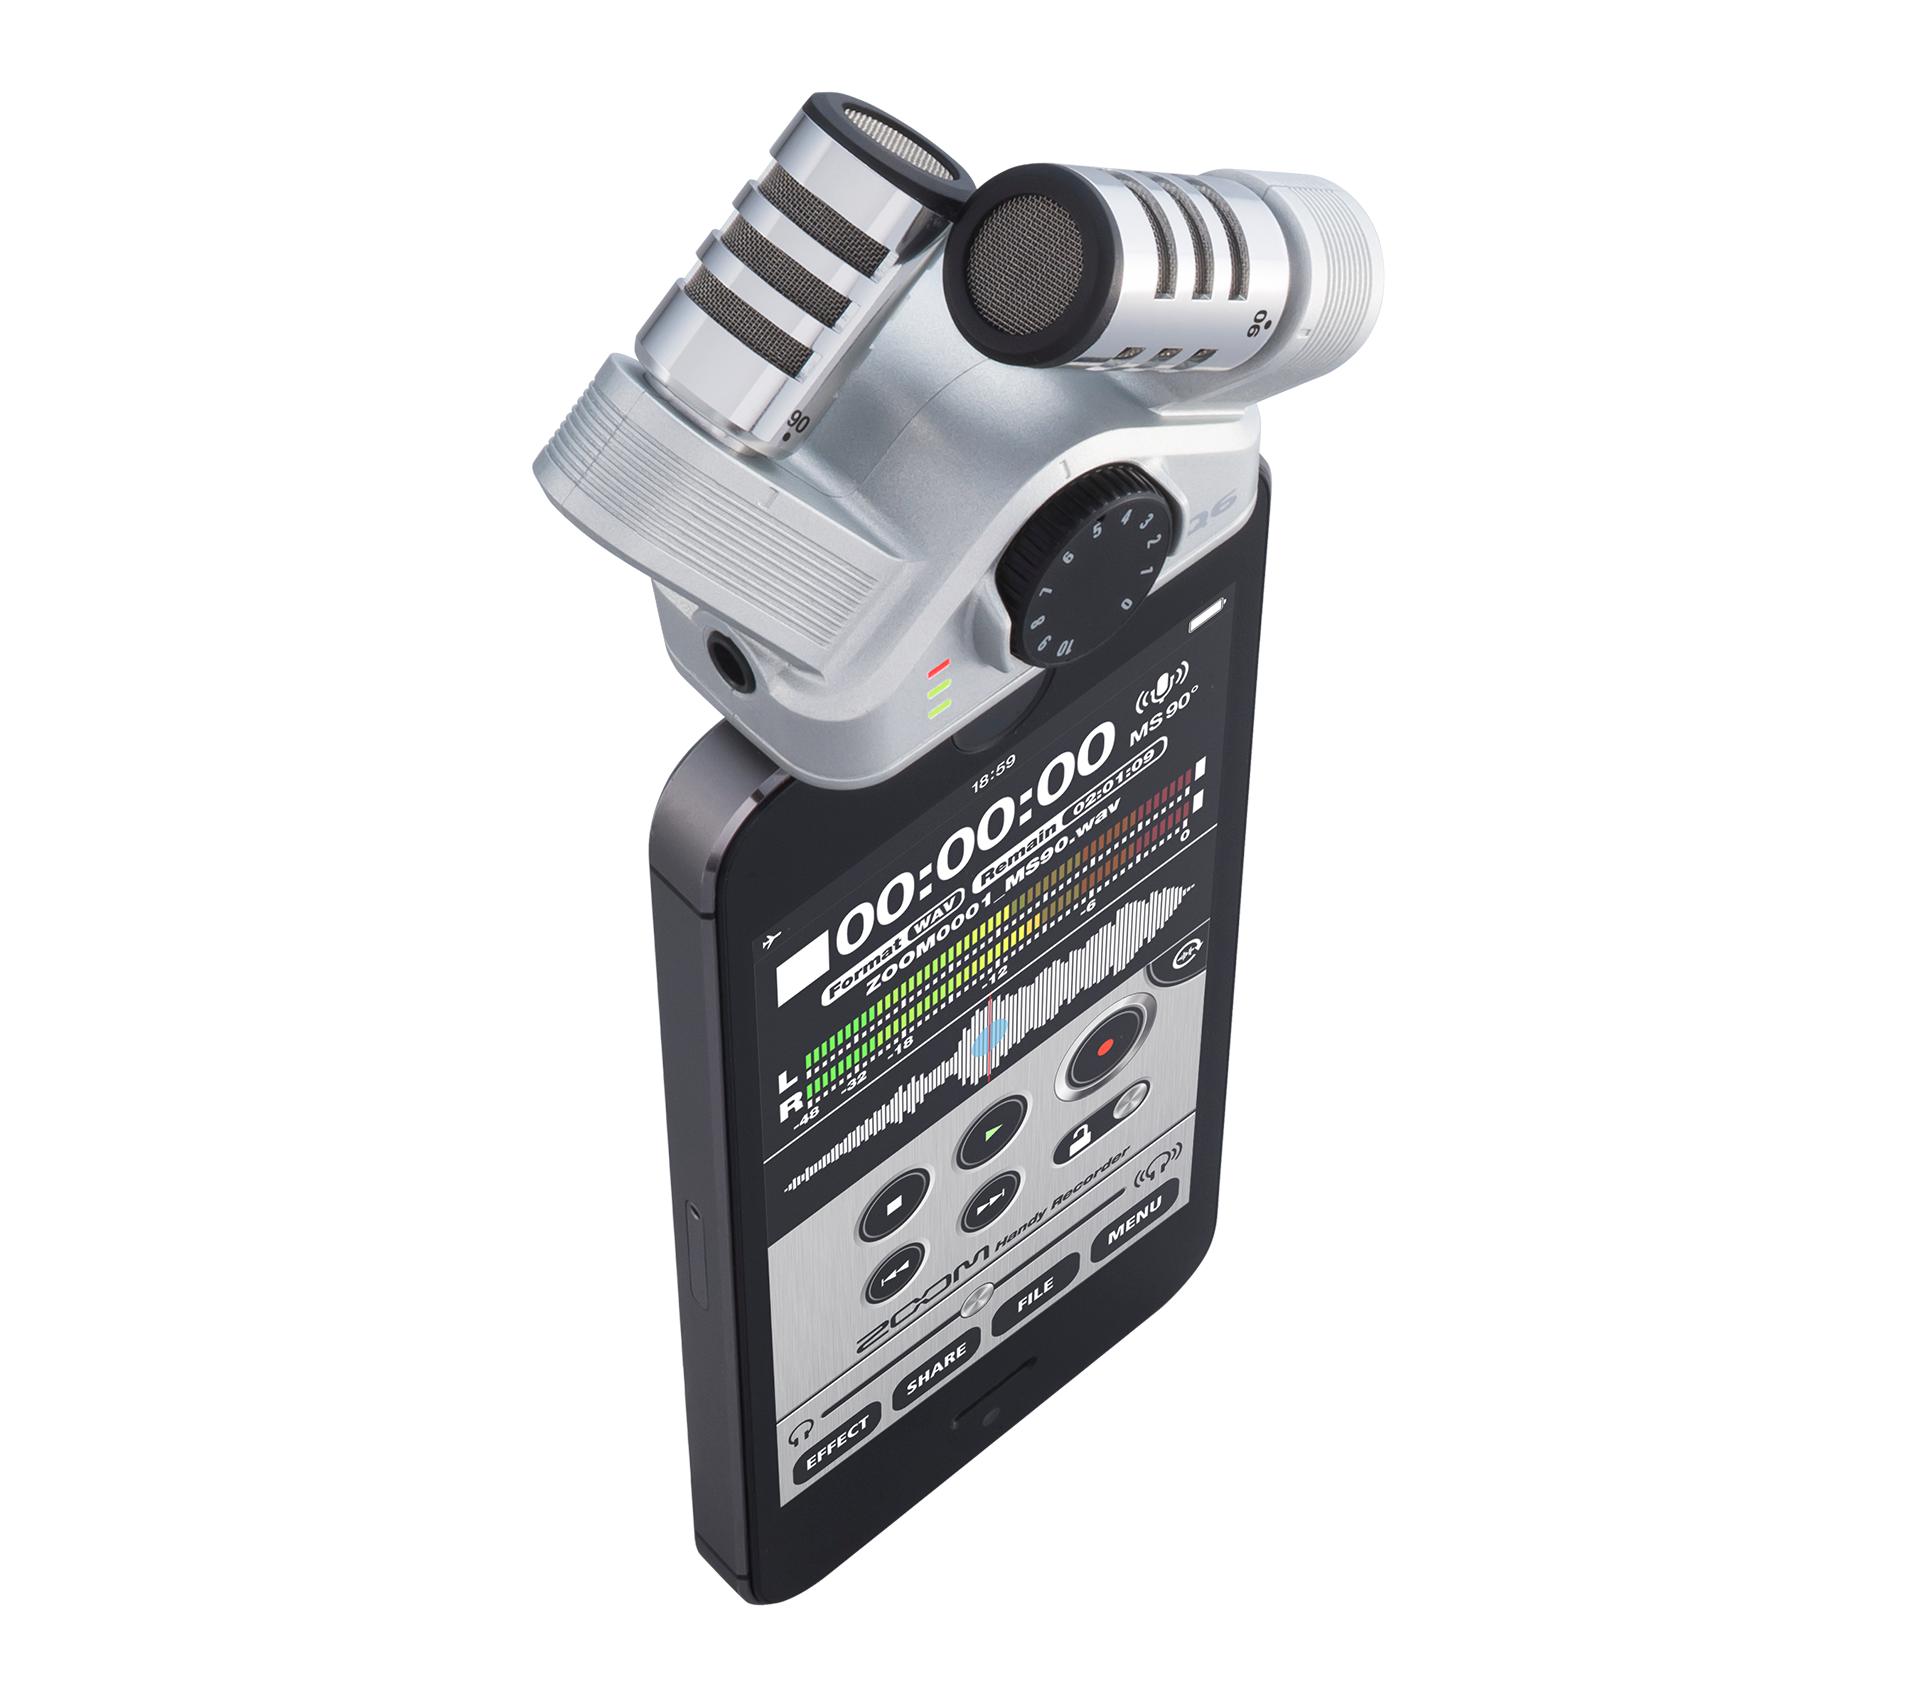 iq6 xy stereo microphone for ios zoom rh zoom co jp manual de instrucciones ipad mini 2 manual de instrucciones ipad air 2